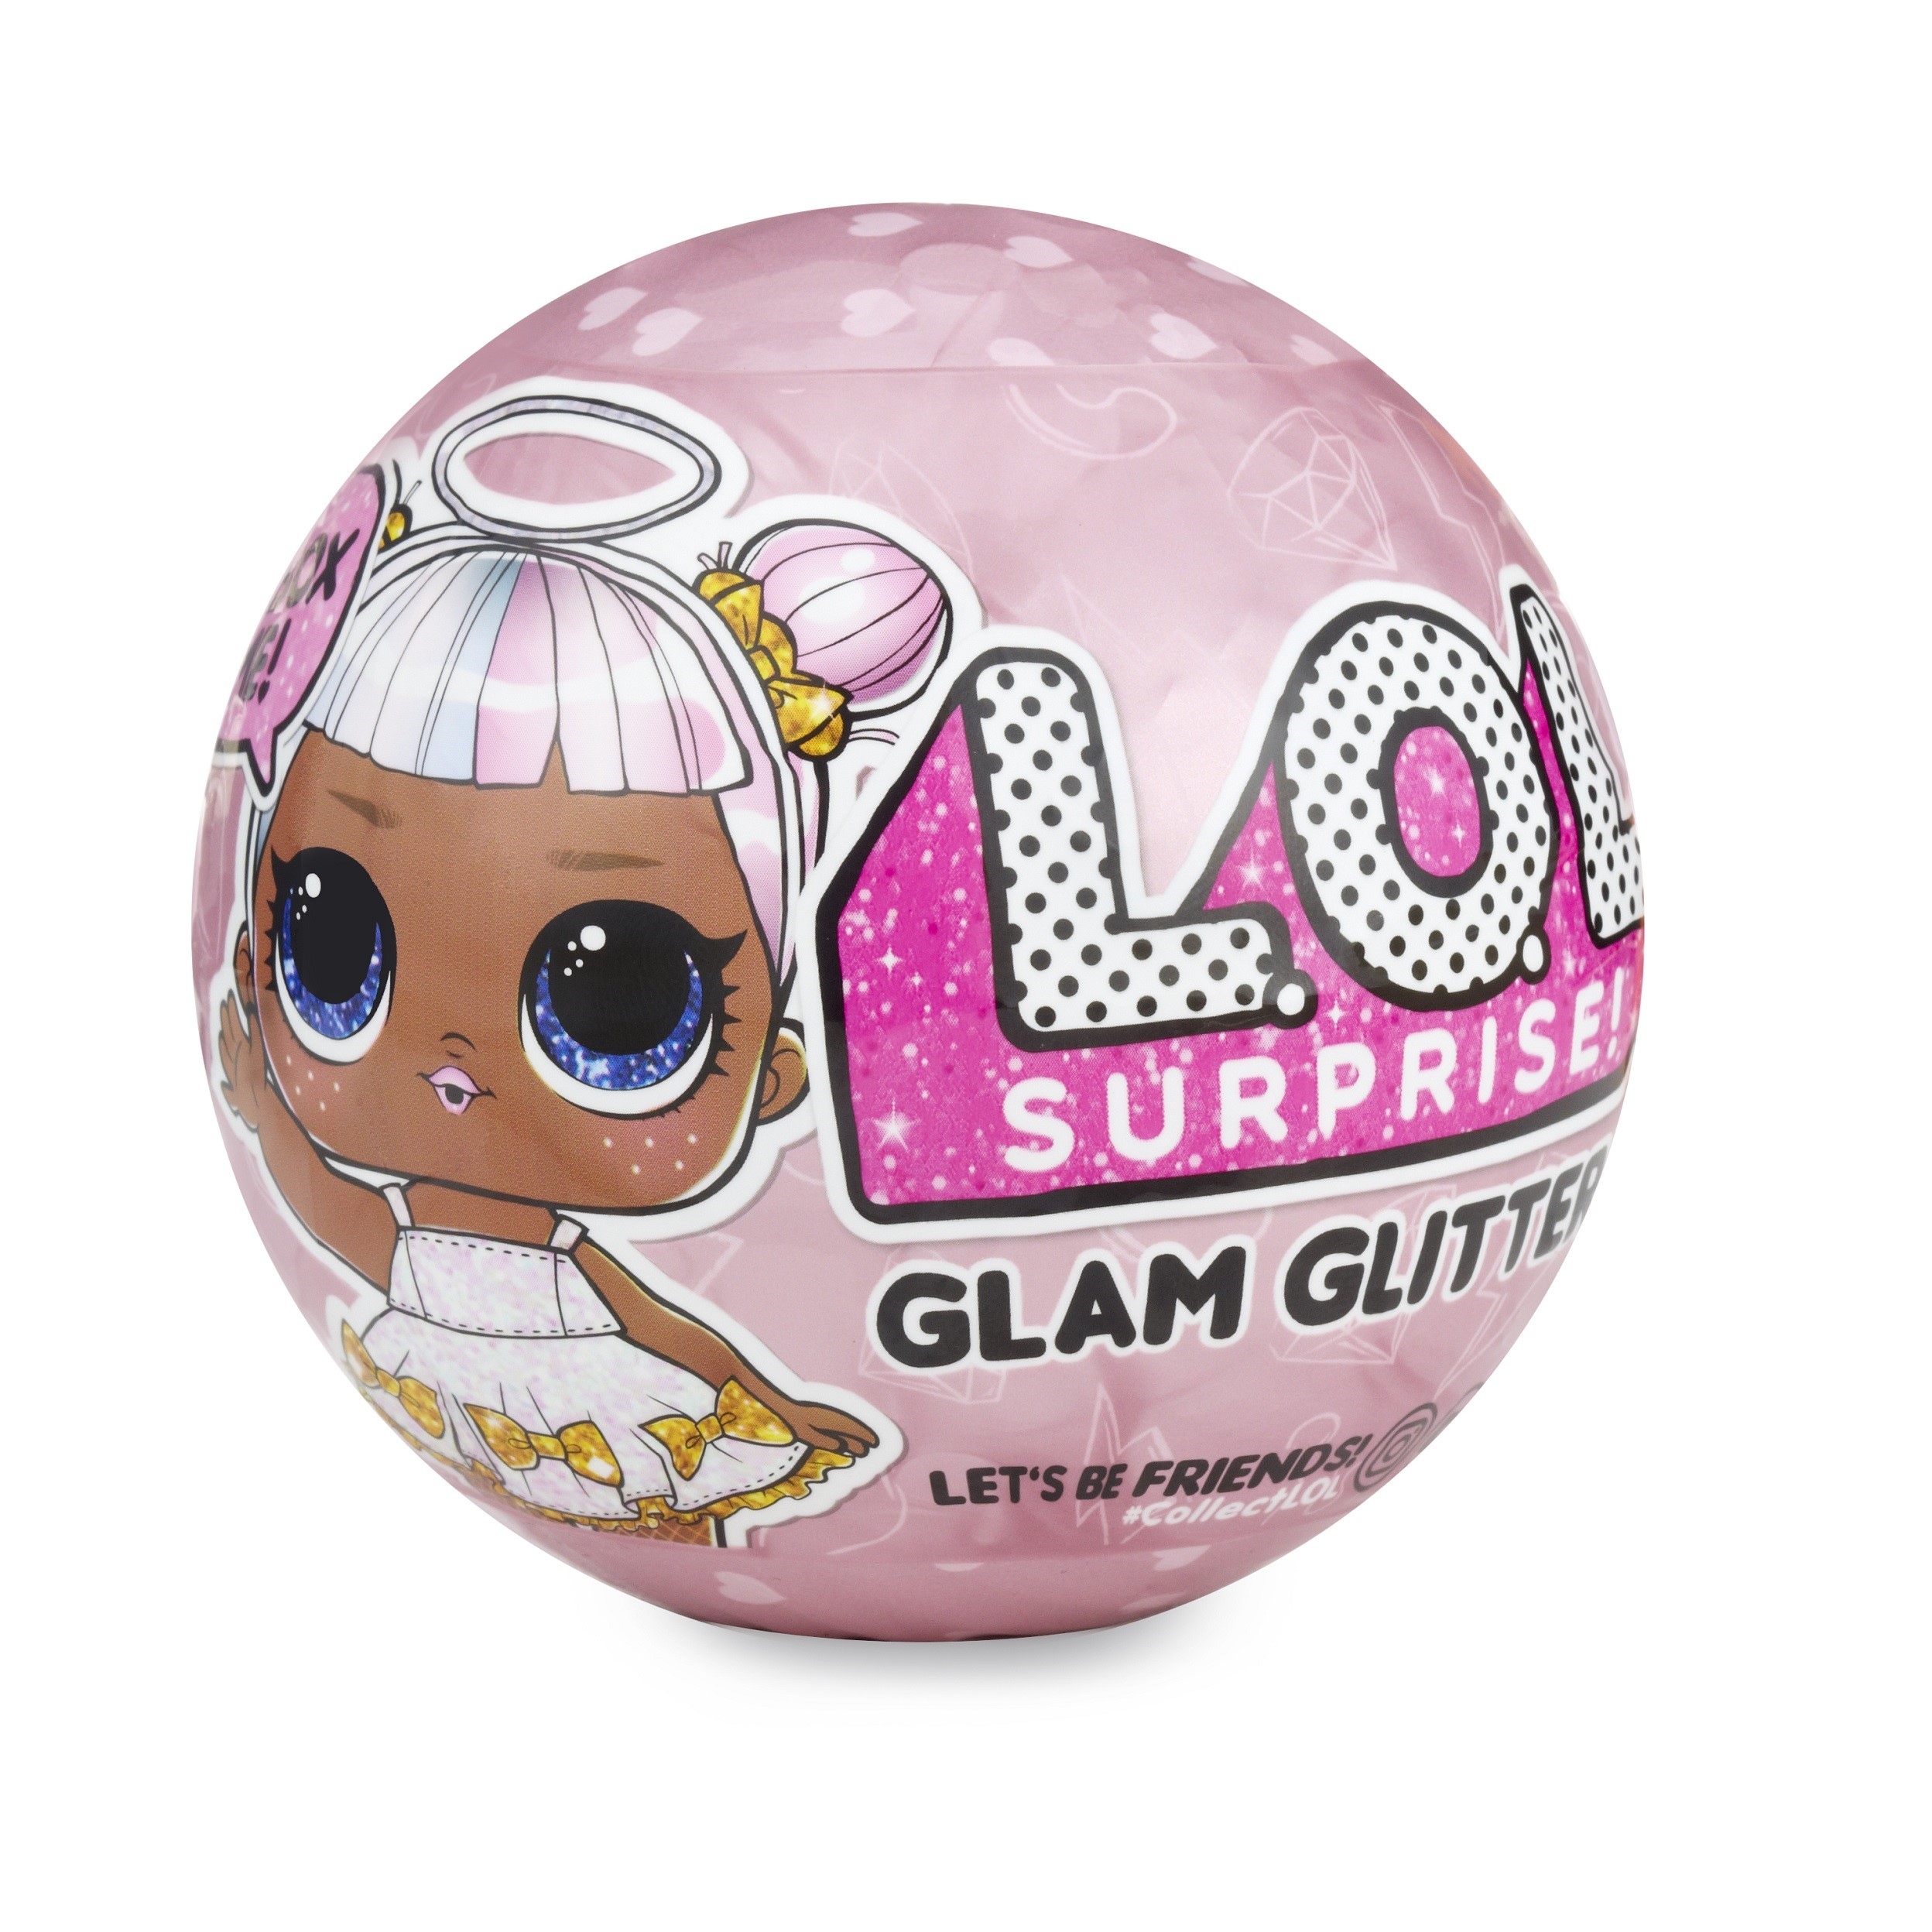 L.O.L. Surprise! Glam Glitter Doll